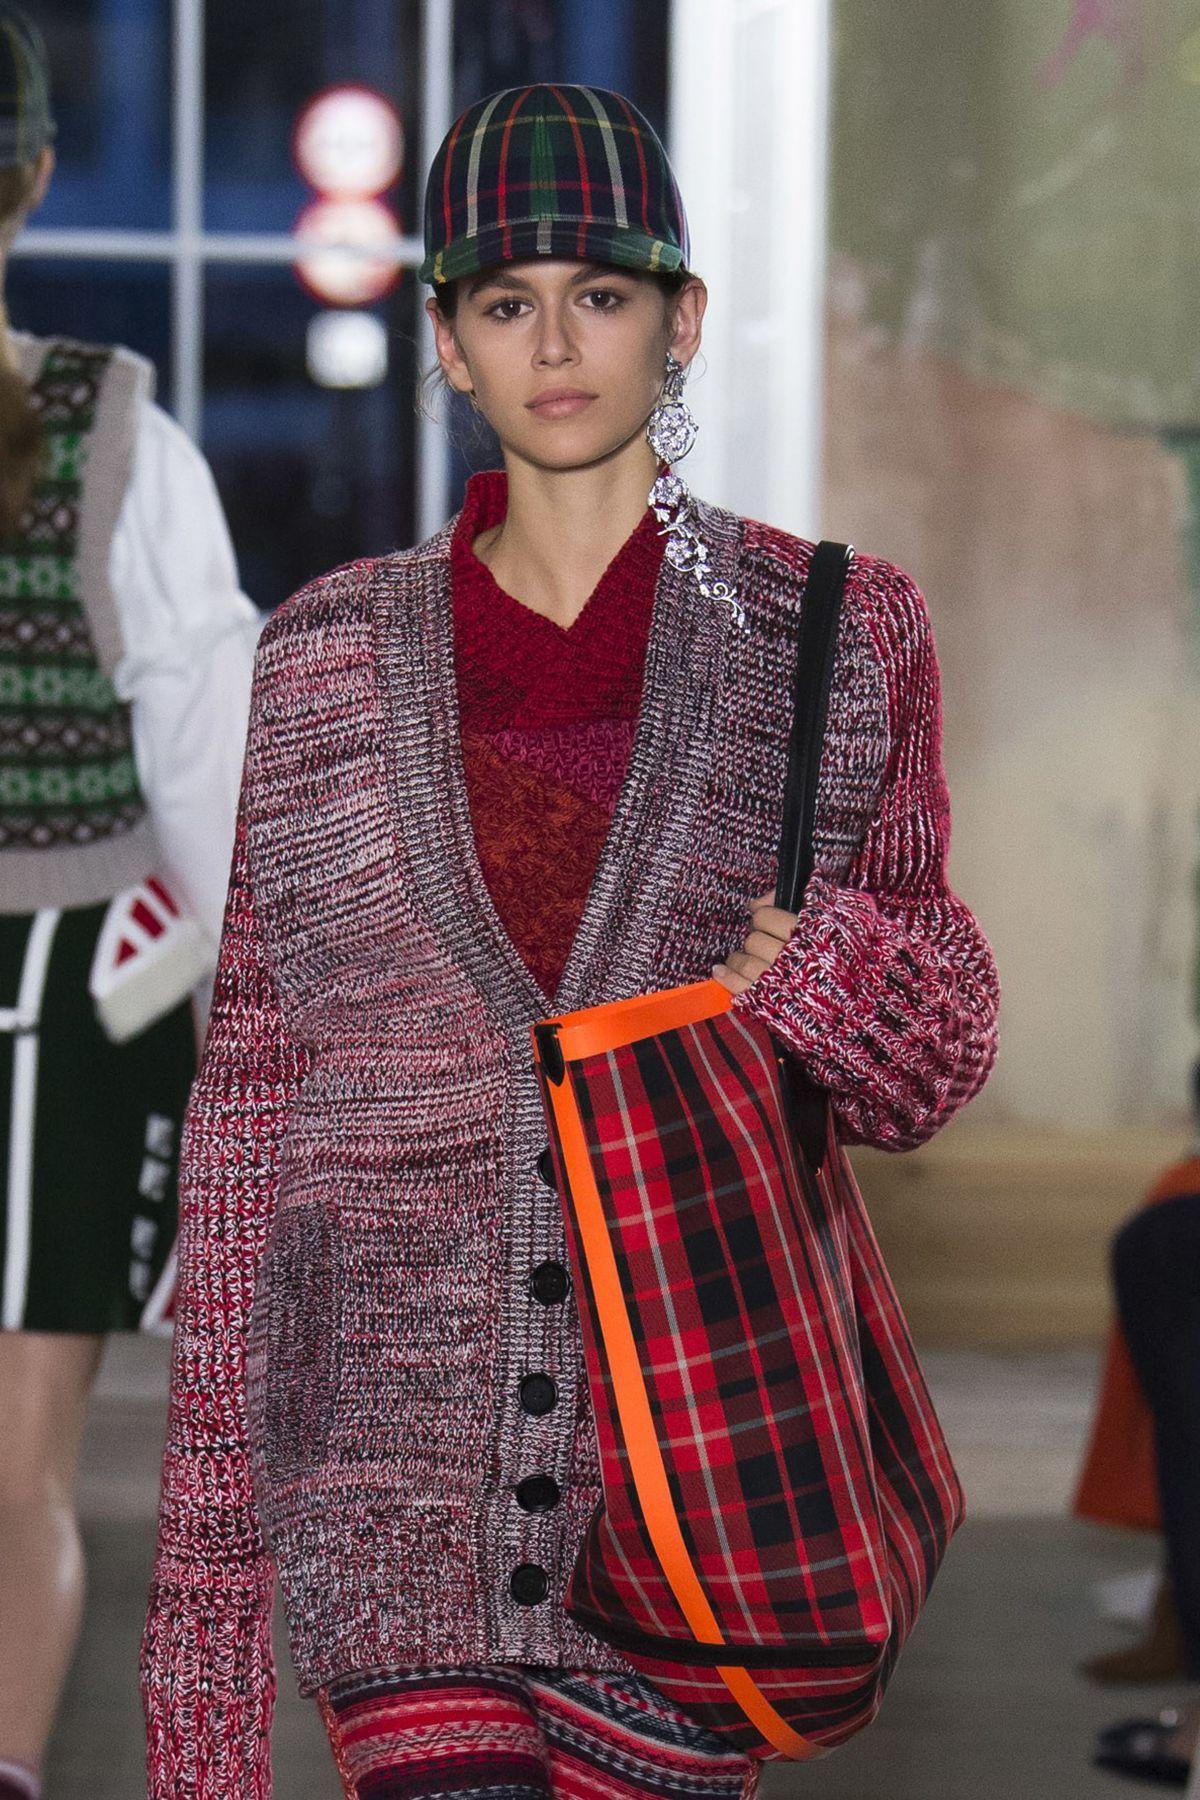 KAIA GERBER at Burberry Fashion Show at London Fashion Week 09/17/2017